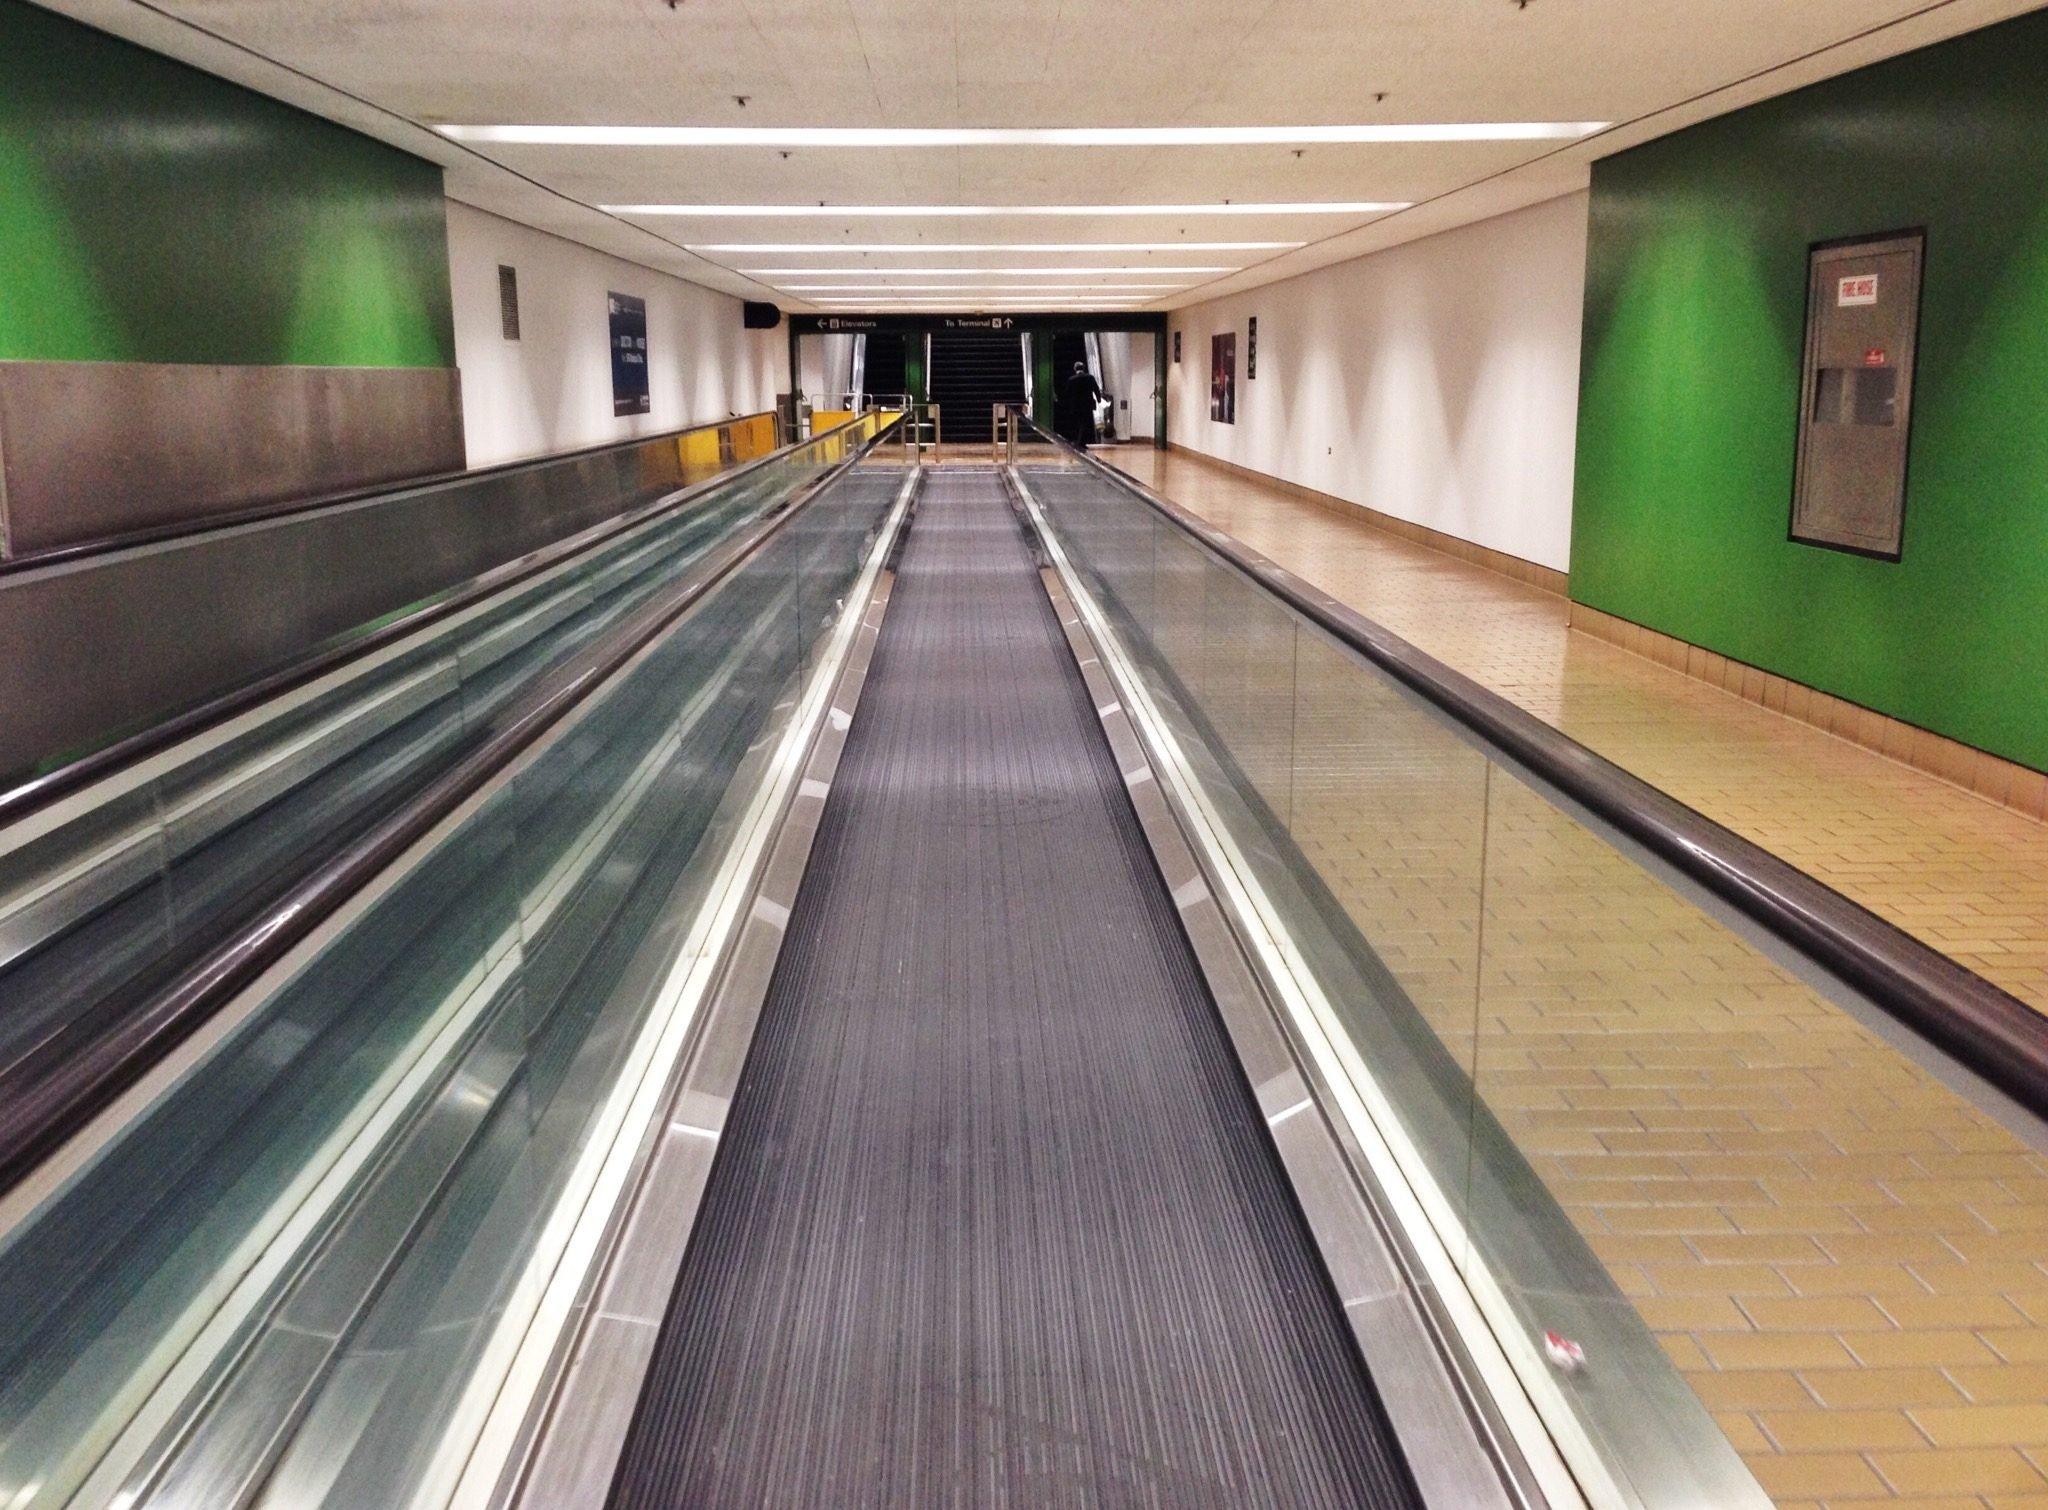 Moving Walkway In Modern Airport